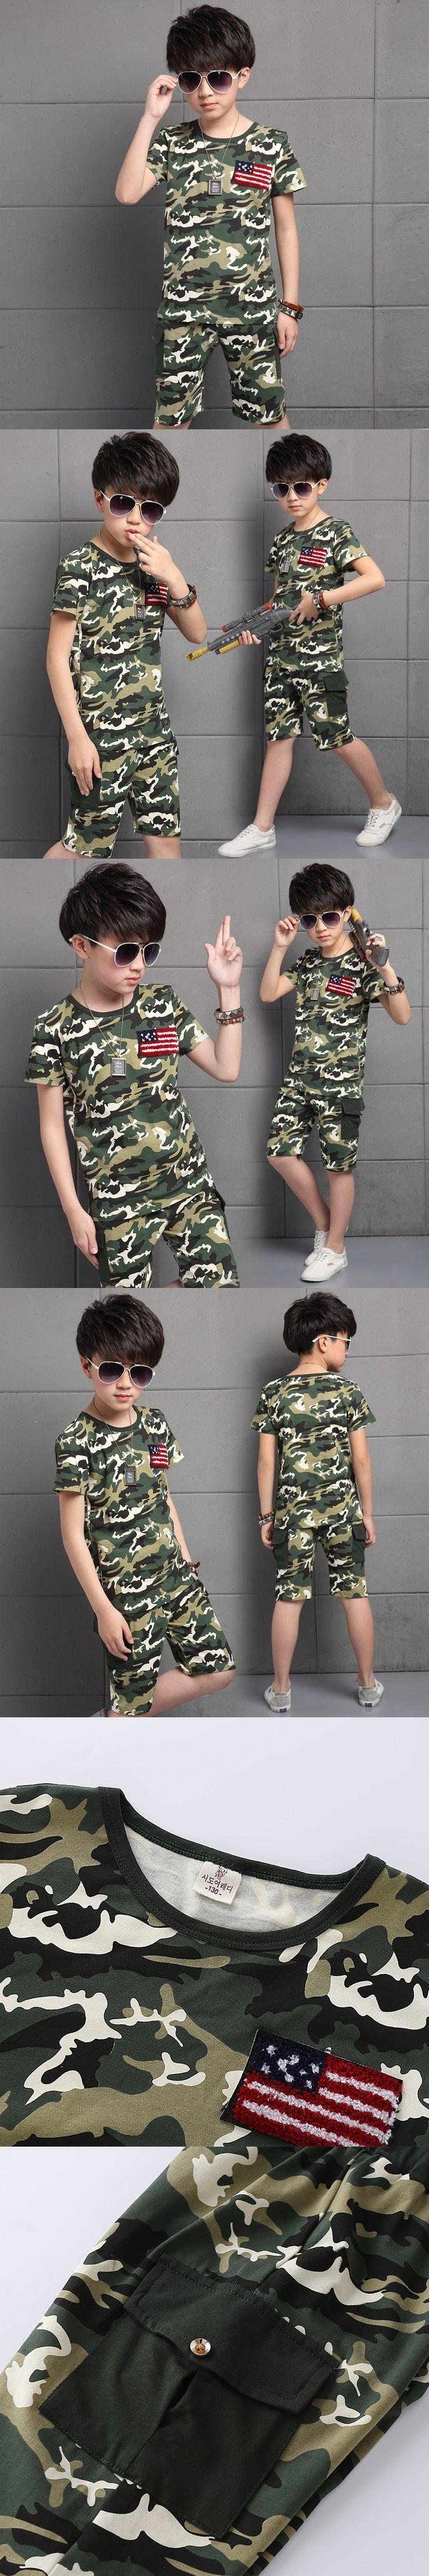 Children Camouflage Suit Summer 2016 New Fashion Boys Clothes Kids T-shirt Pants Boys Clothes Outfit Age 4-14T Minions Clothes